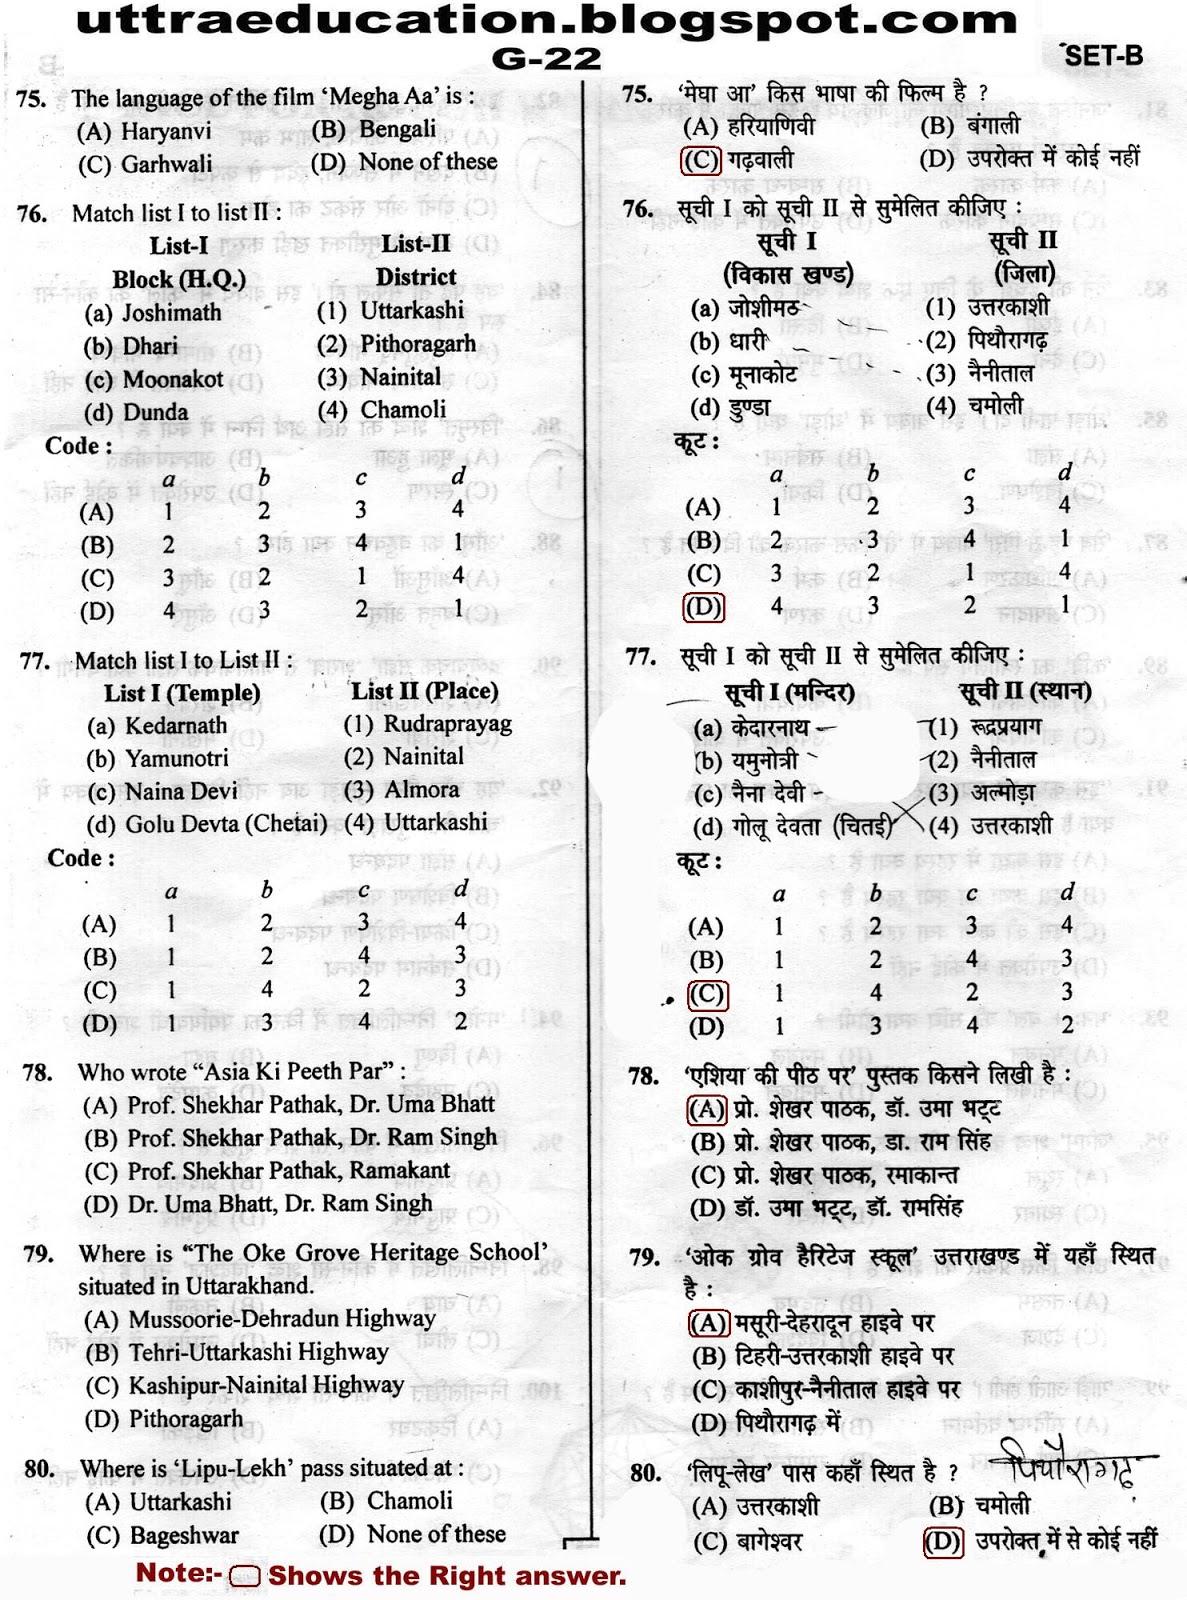 Uttaraeducation: G-22 ANSWER KEY & QUESTION PAPER OF SAMUH